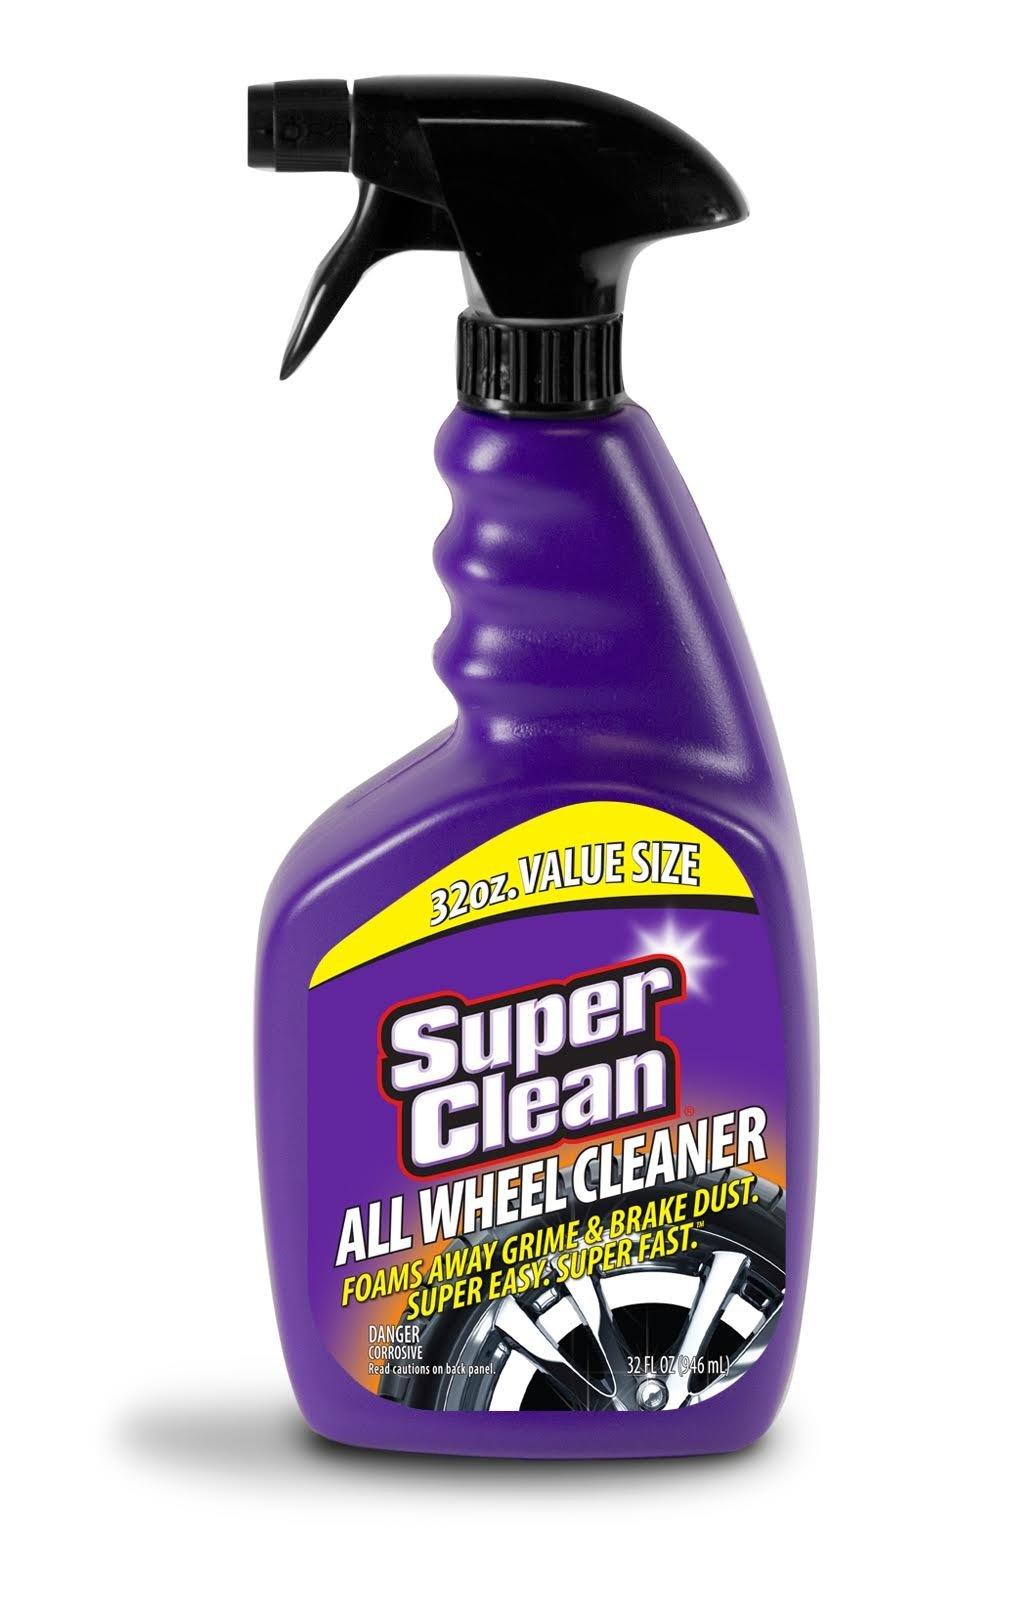 SuperClean Foaming All Wheel Cleaner, Safe for all Wheels & Rims, Brake Dust Cleaner, Grime Eliminator, 6 pack (192 ounces)